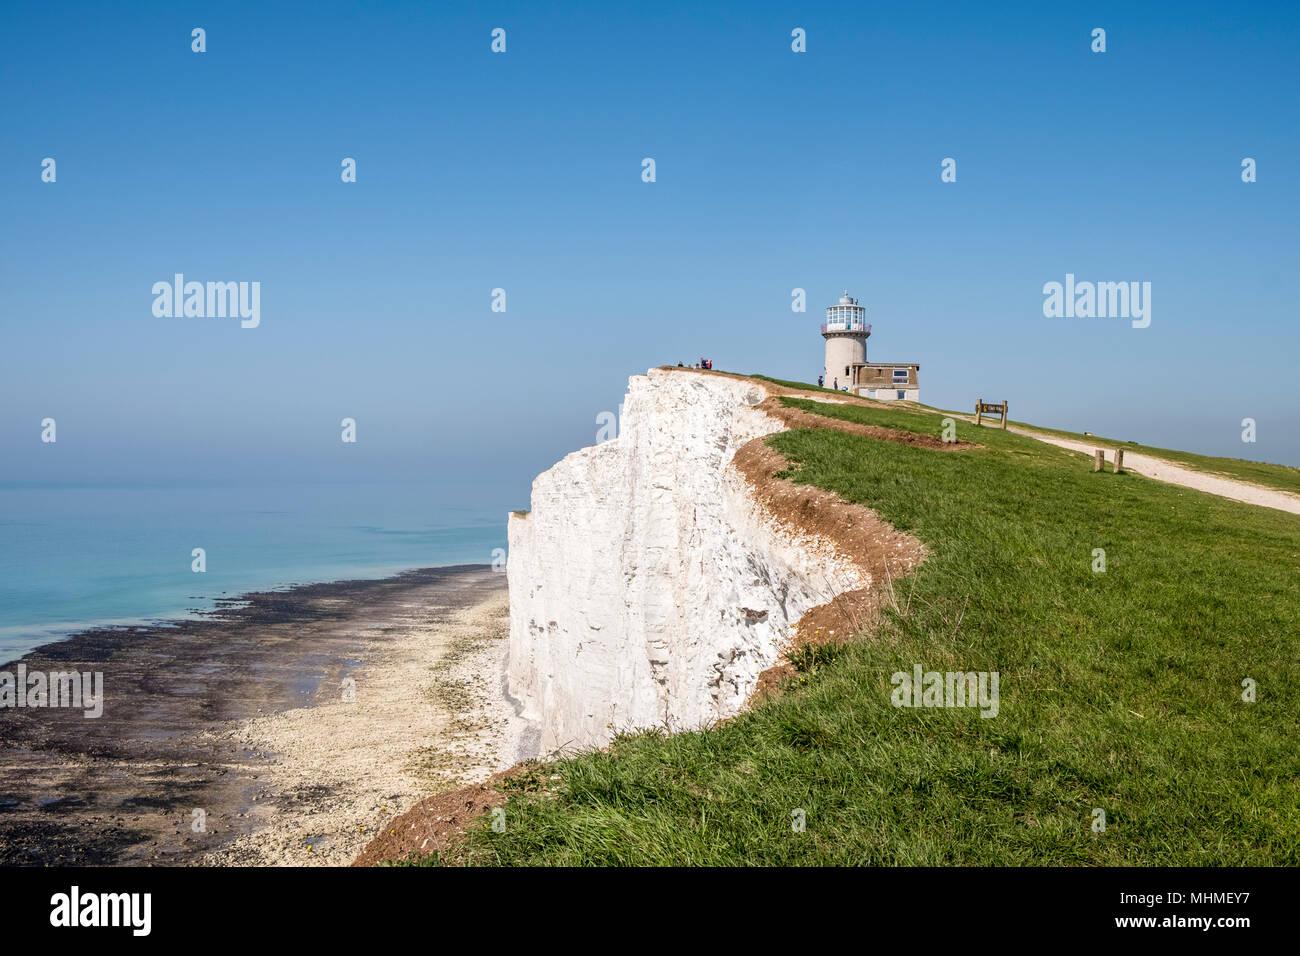 Belle Tout Lighthouse, auch bekannt als Belle Toute, ist die stillgelegte Leuchtturm am Beachy Head, East Sussex, Südengland, GB, UK Stockbild